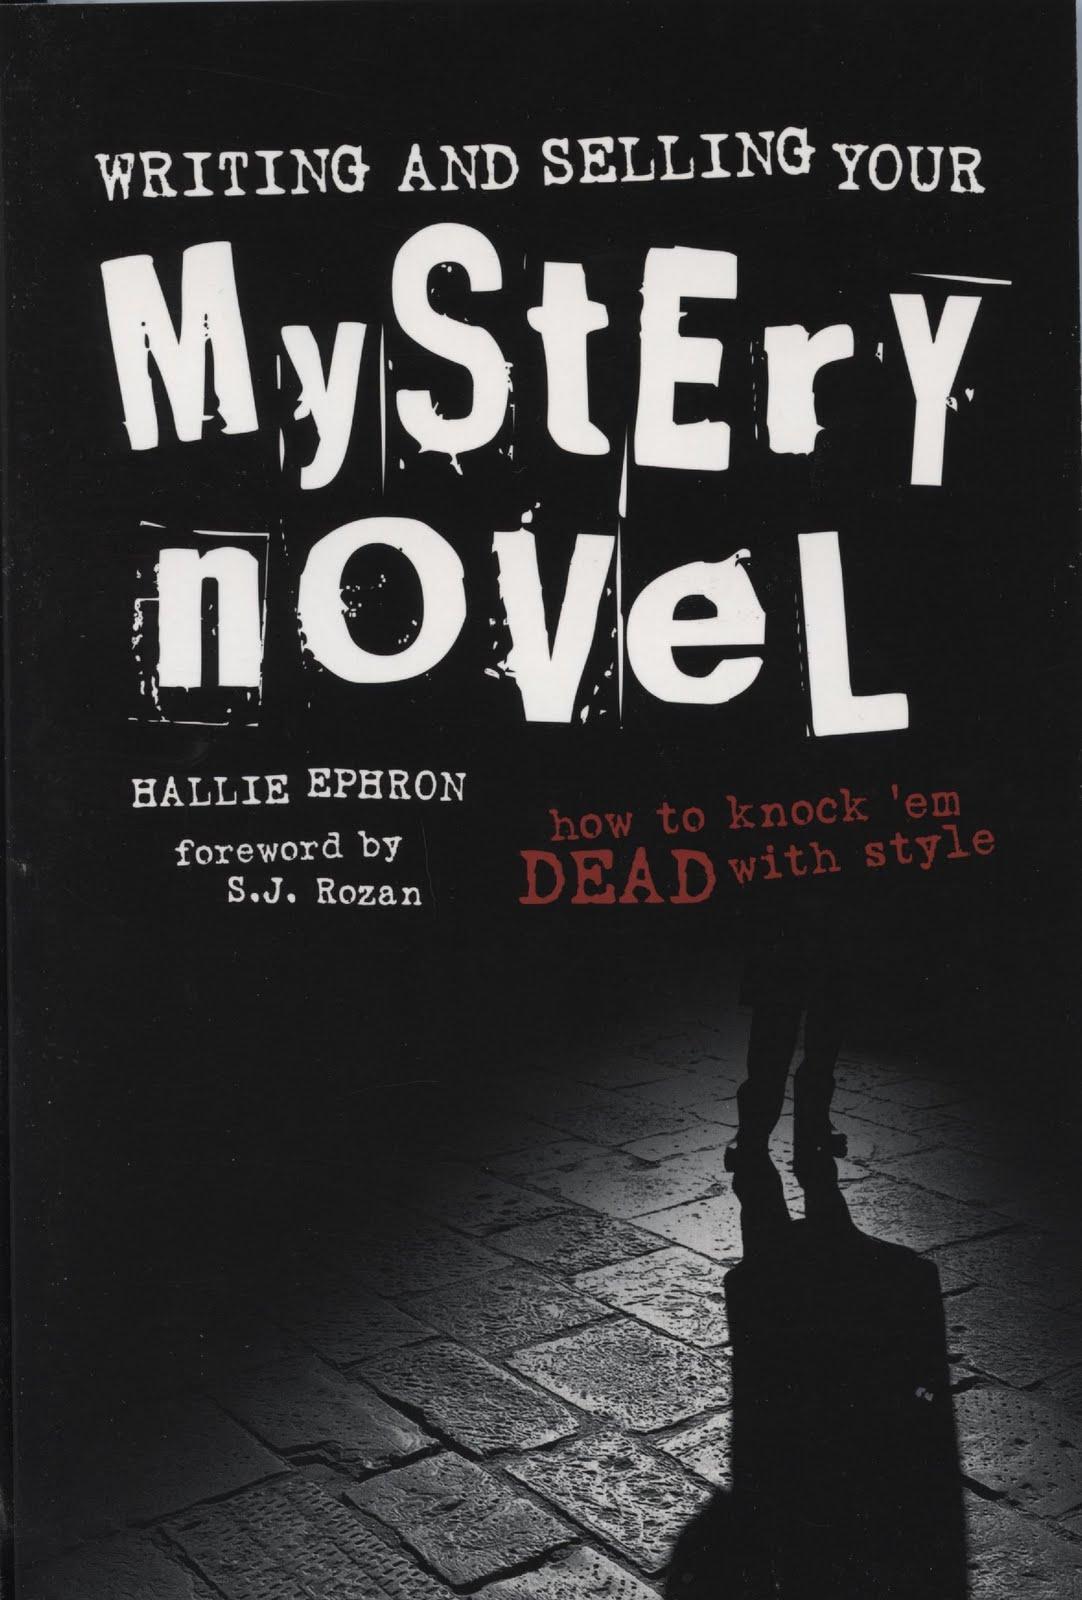 How to write a mystery novel book